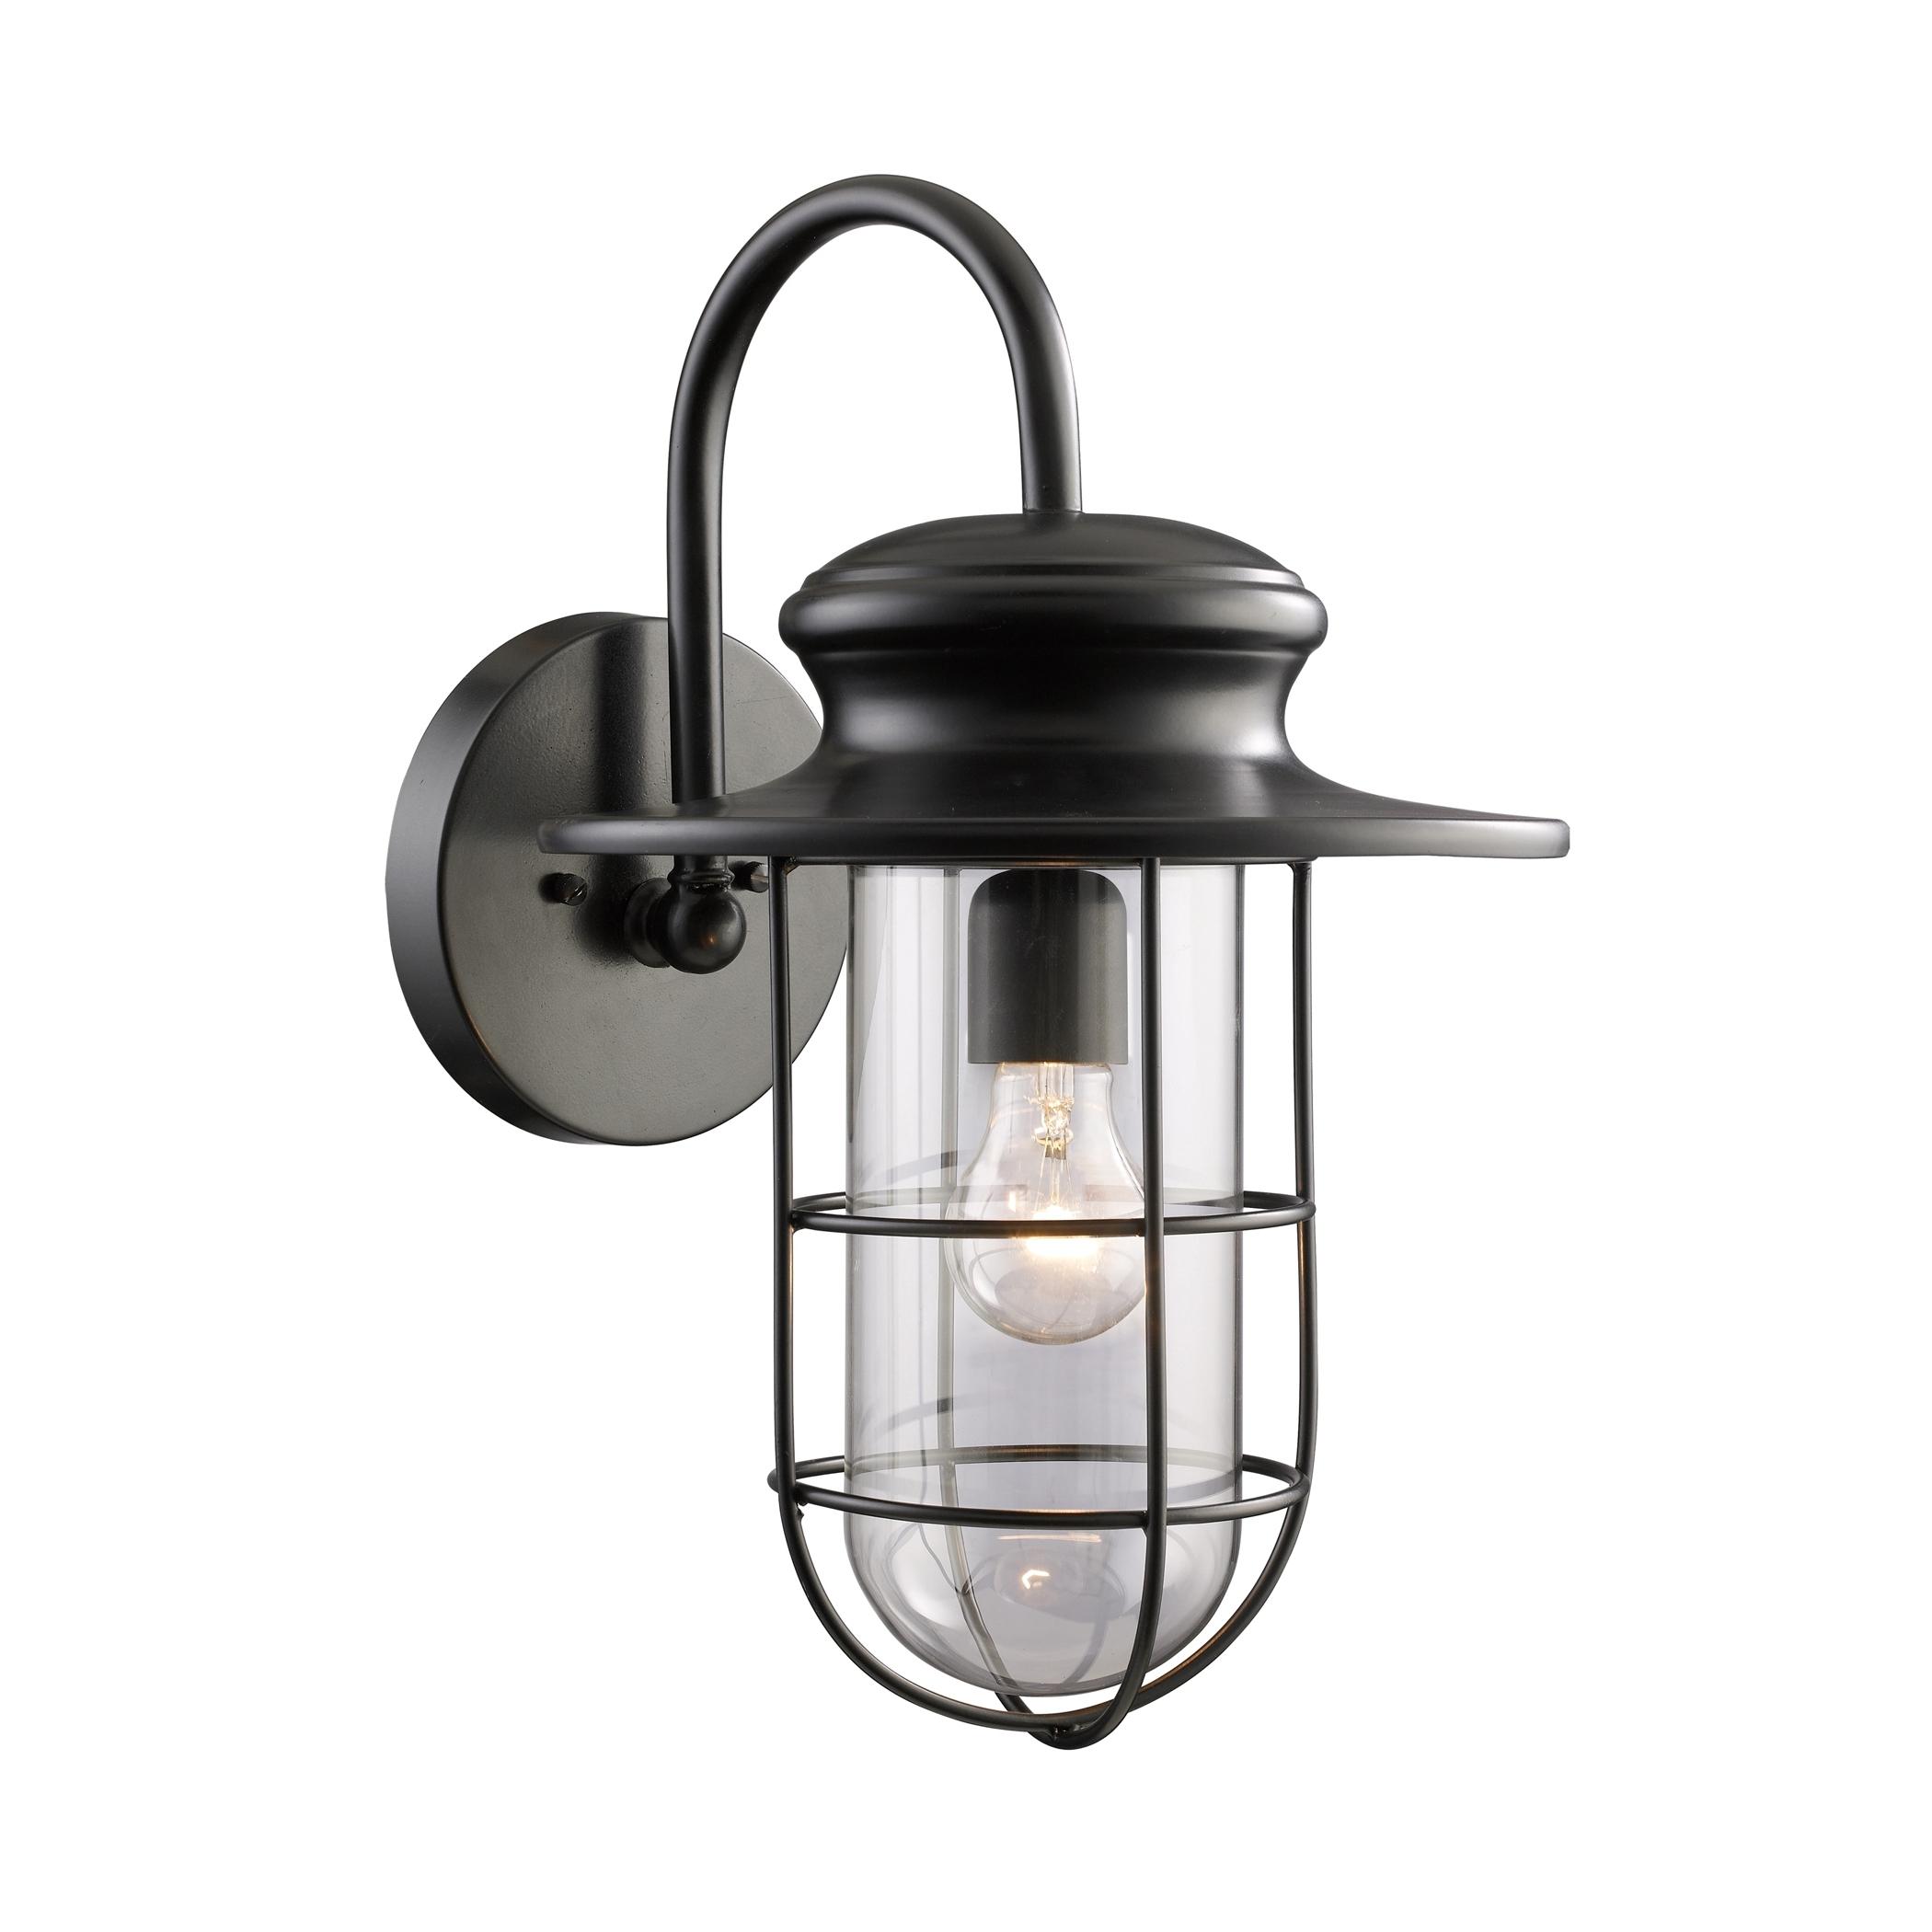 Preferred Exterior Industrial Light Outdoor Fixture Lighting Uk Wall Mount Within Industrial Outdoor Lanterns (View 11 of 20)